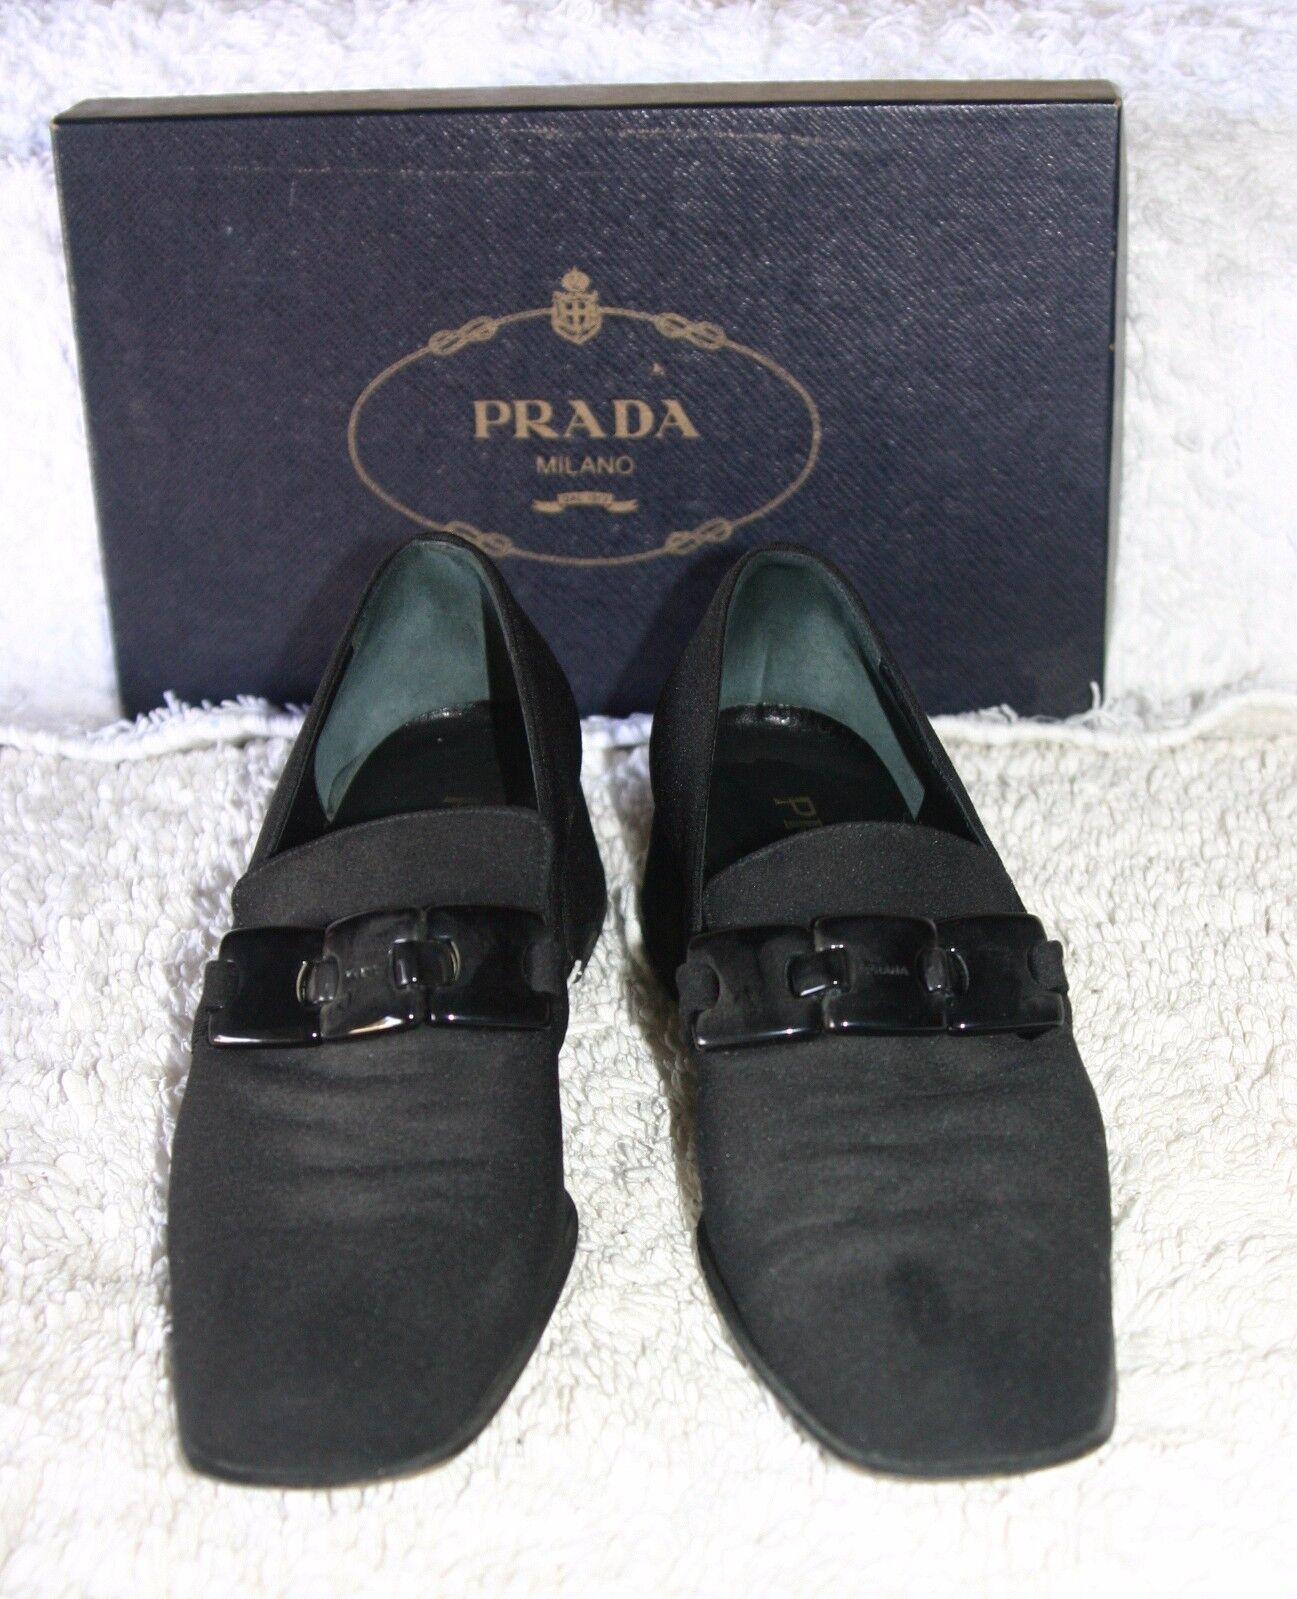 Prada Women's Black Canvas Loafers w  Linked Belt across front..Size 38.5 - 8 M